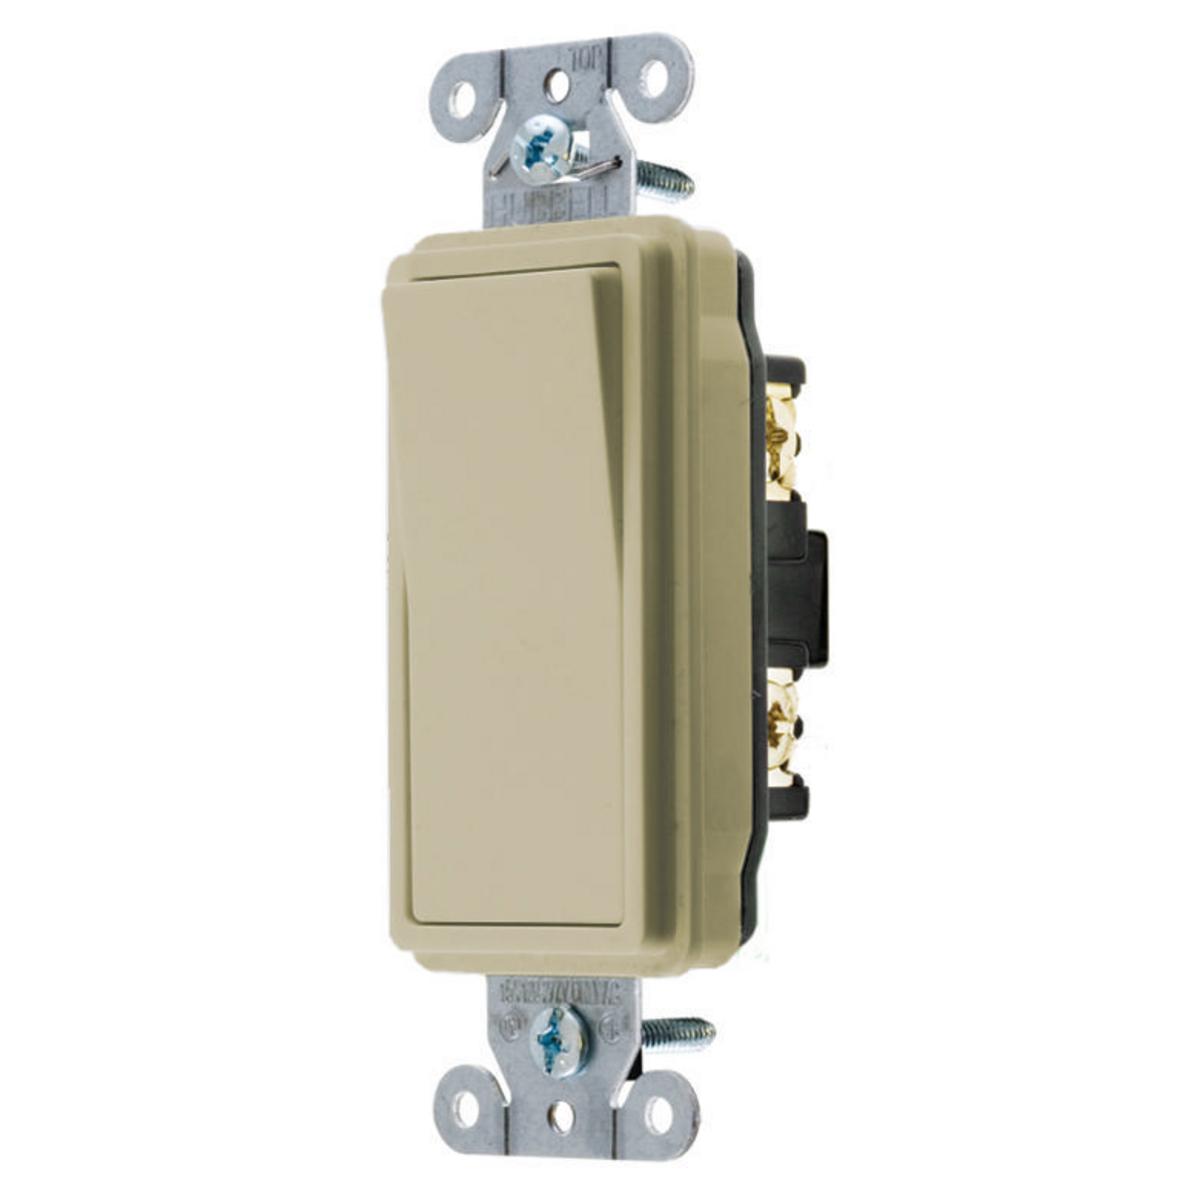 Wiring Device-KellemsDS120I